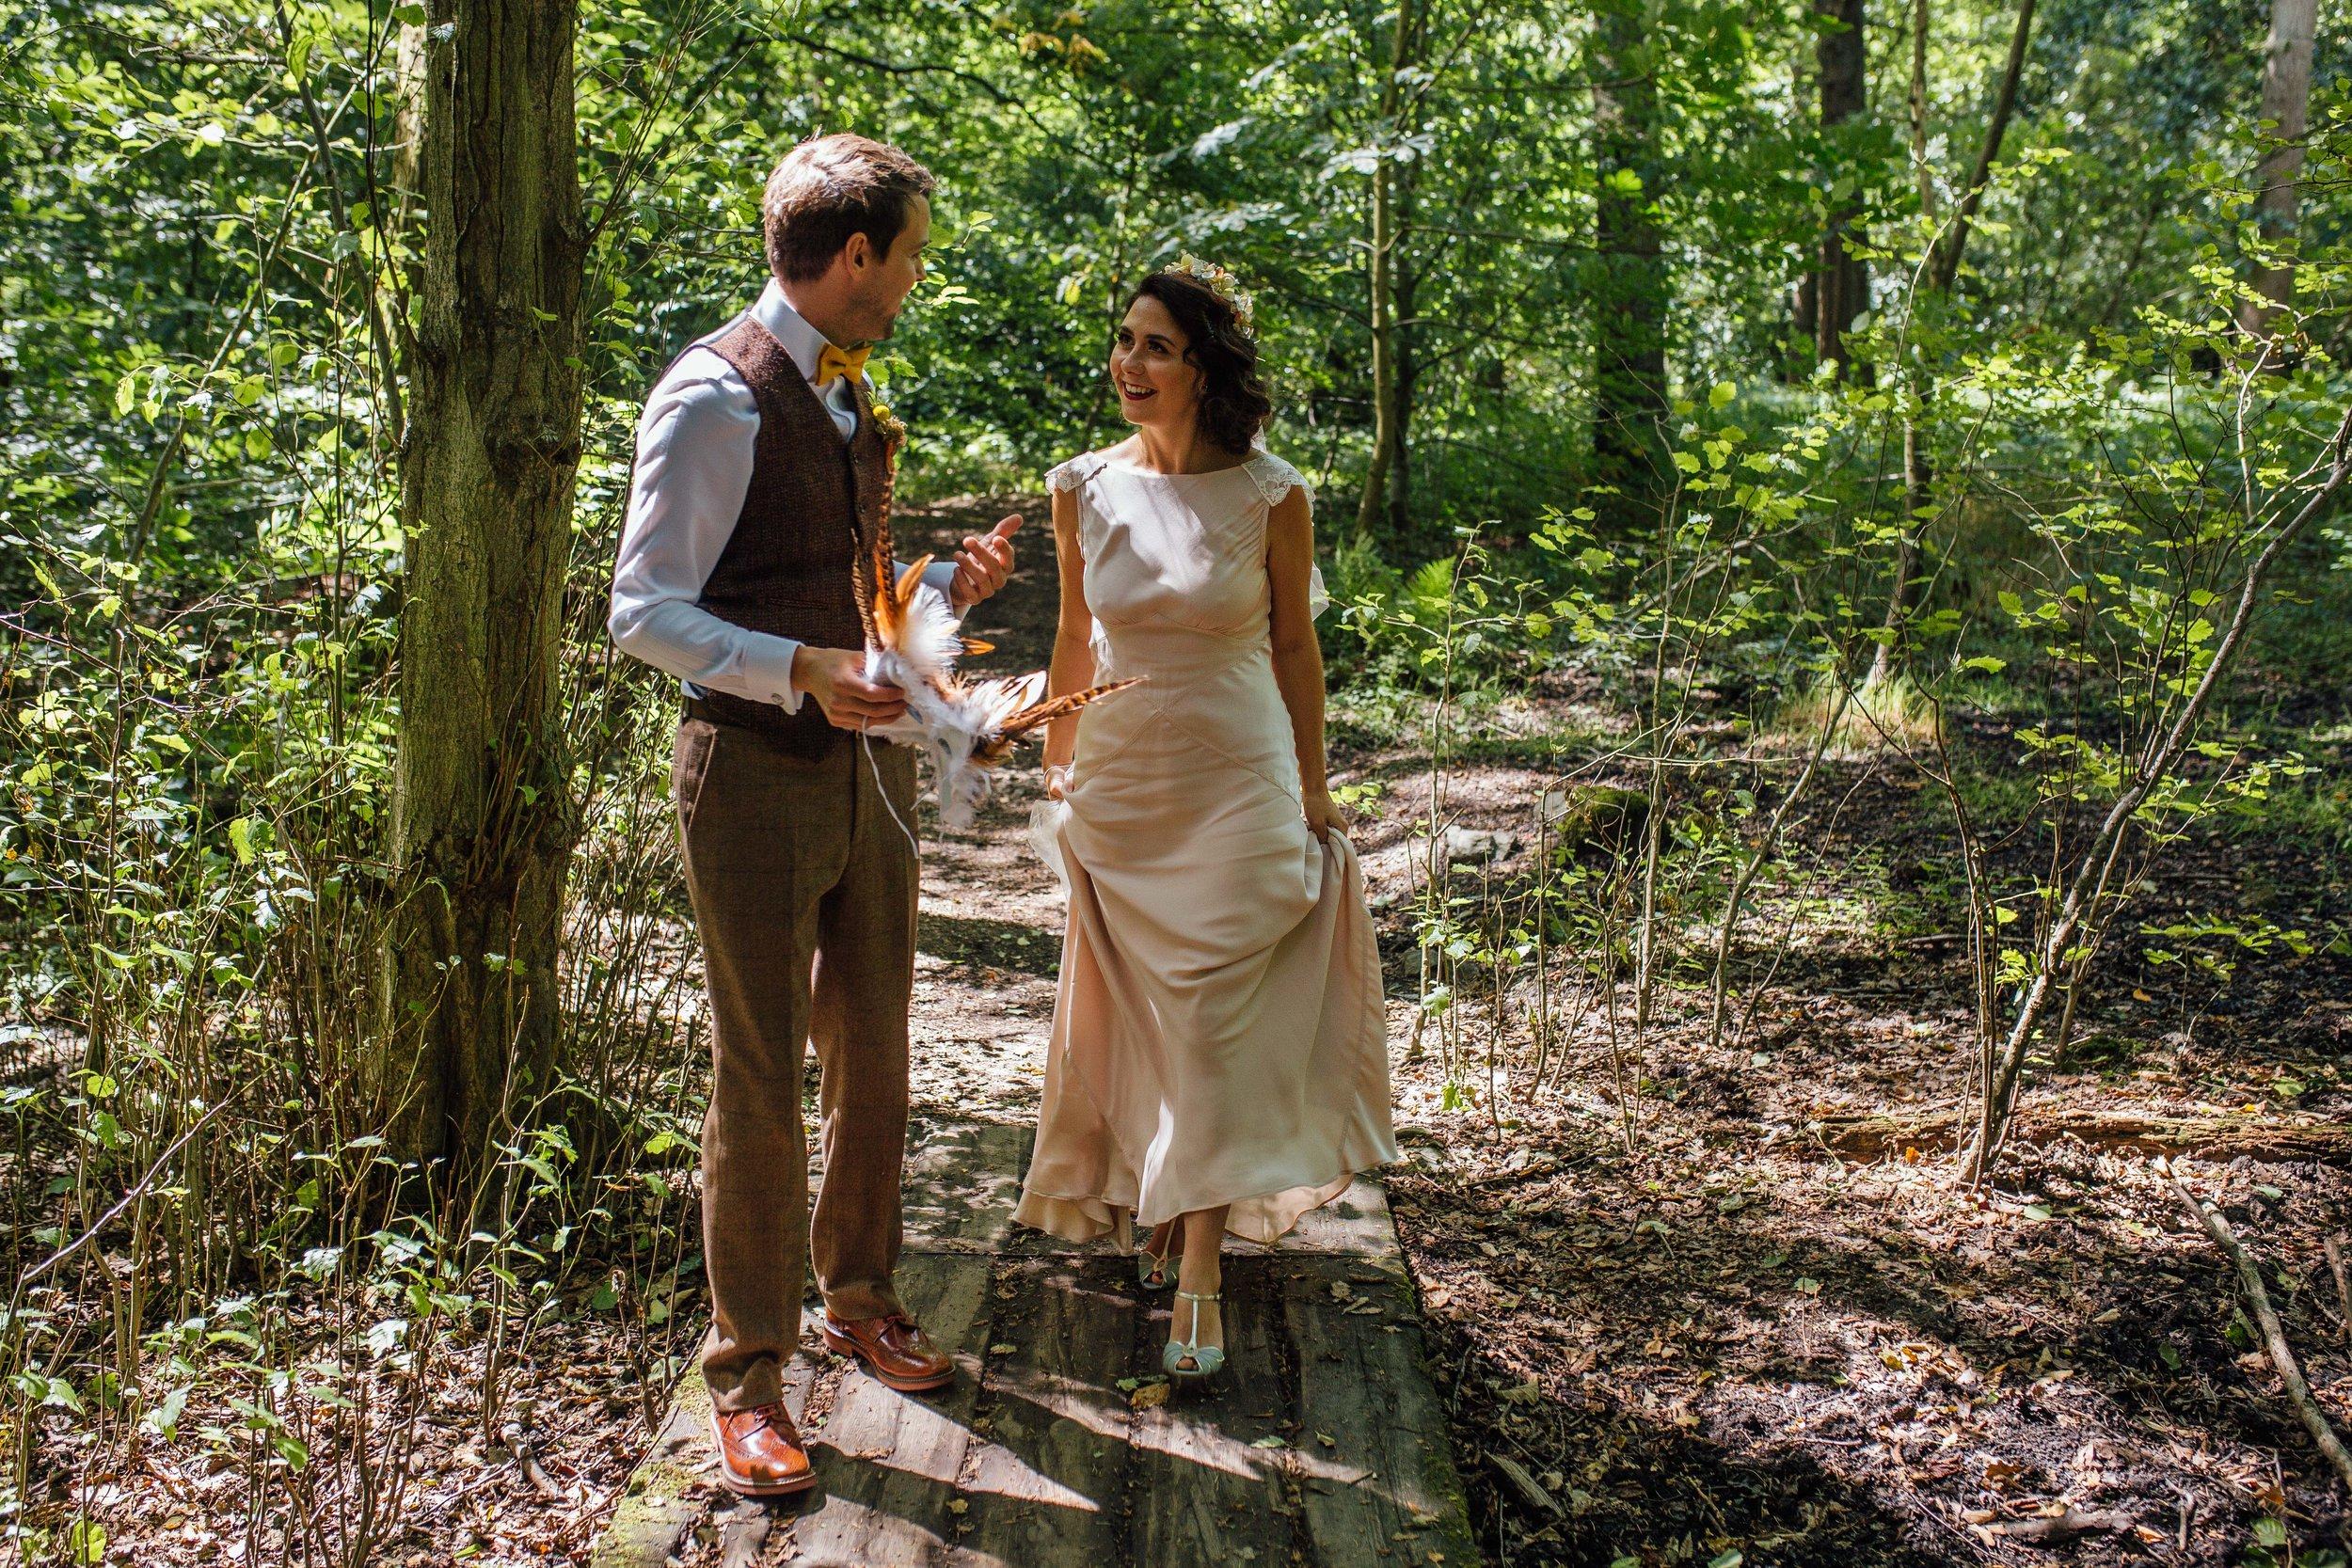 Katy-Bespoke-Veil-Sheffield-Wedding-Wes-Anderson-Susanna-Greening-Derbyshire-12